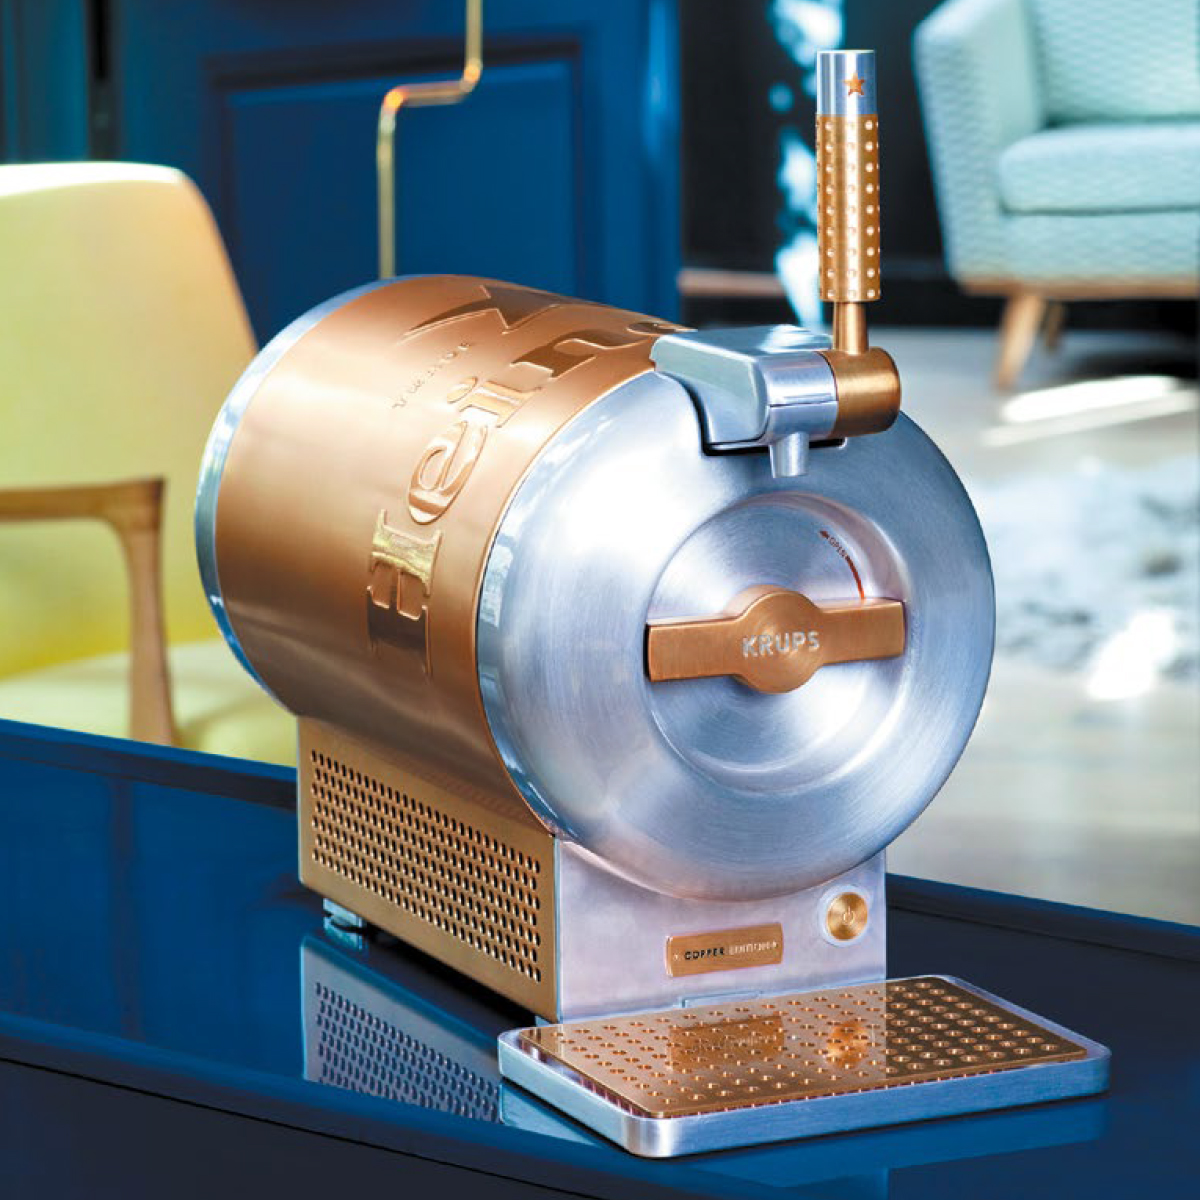 heineken-sub-copper-edition-2015-sub-store-paris